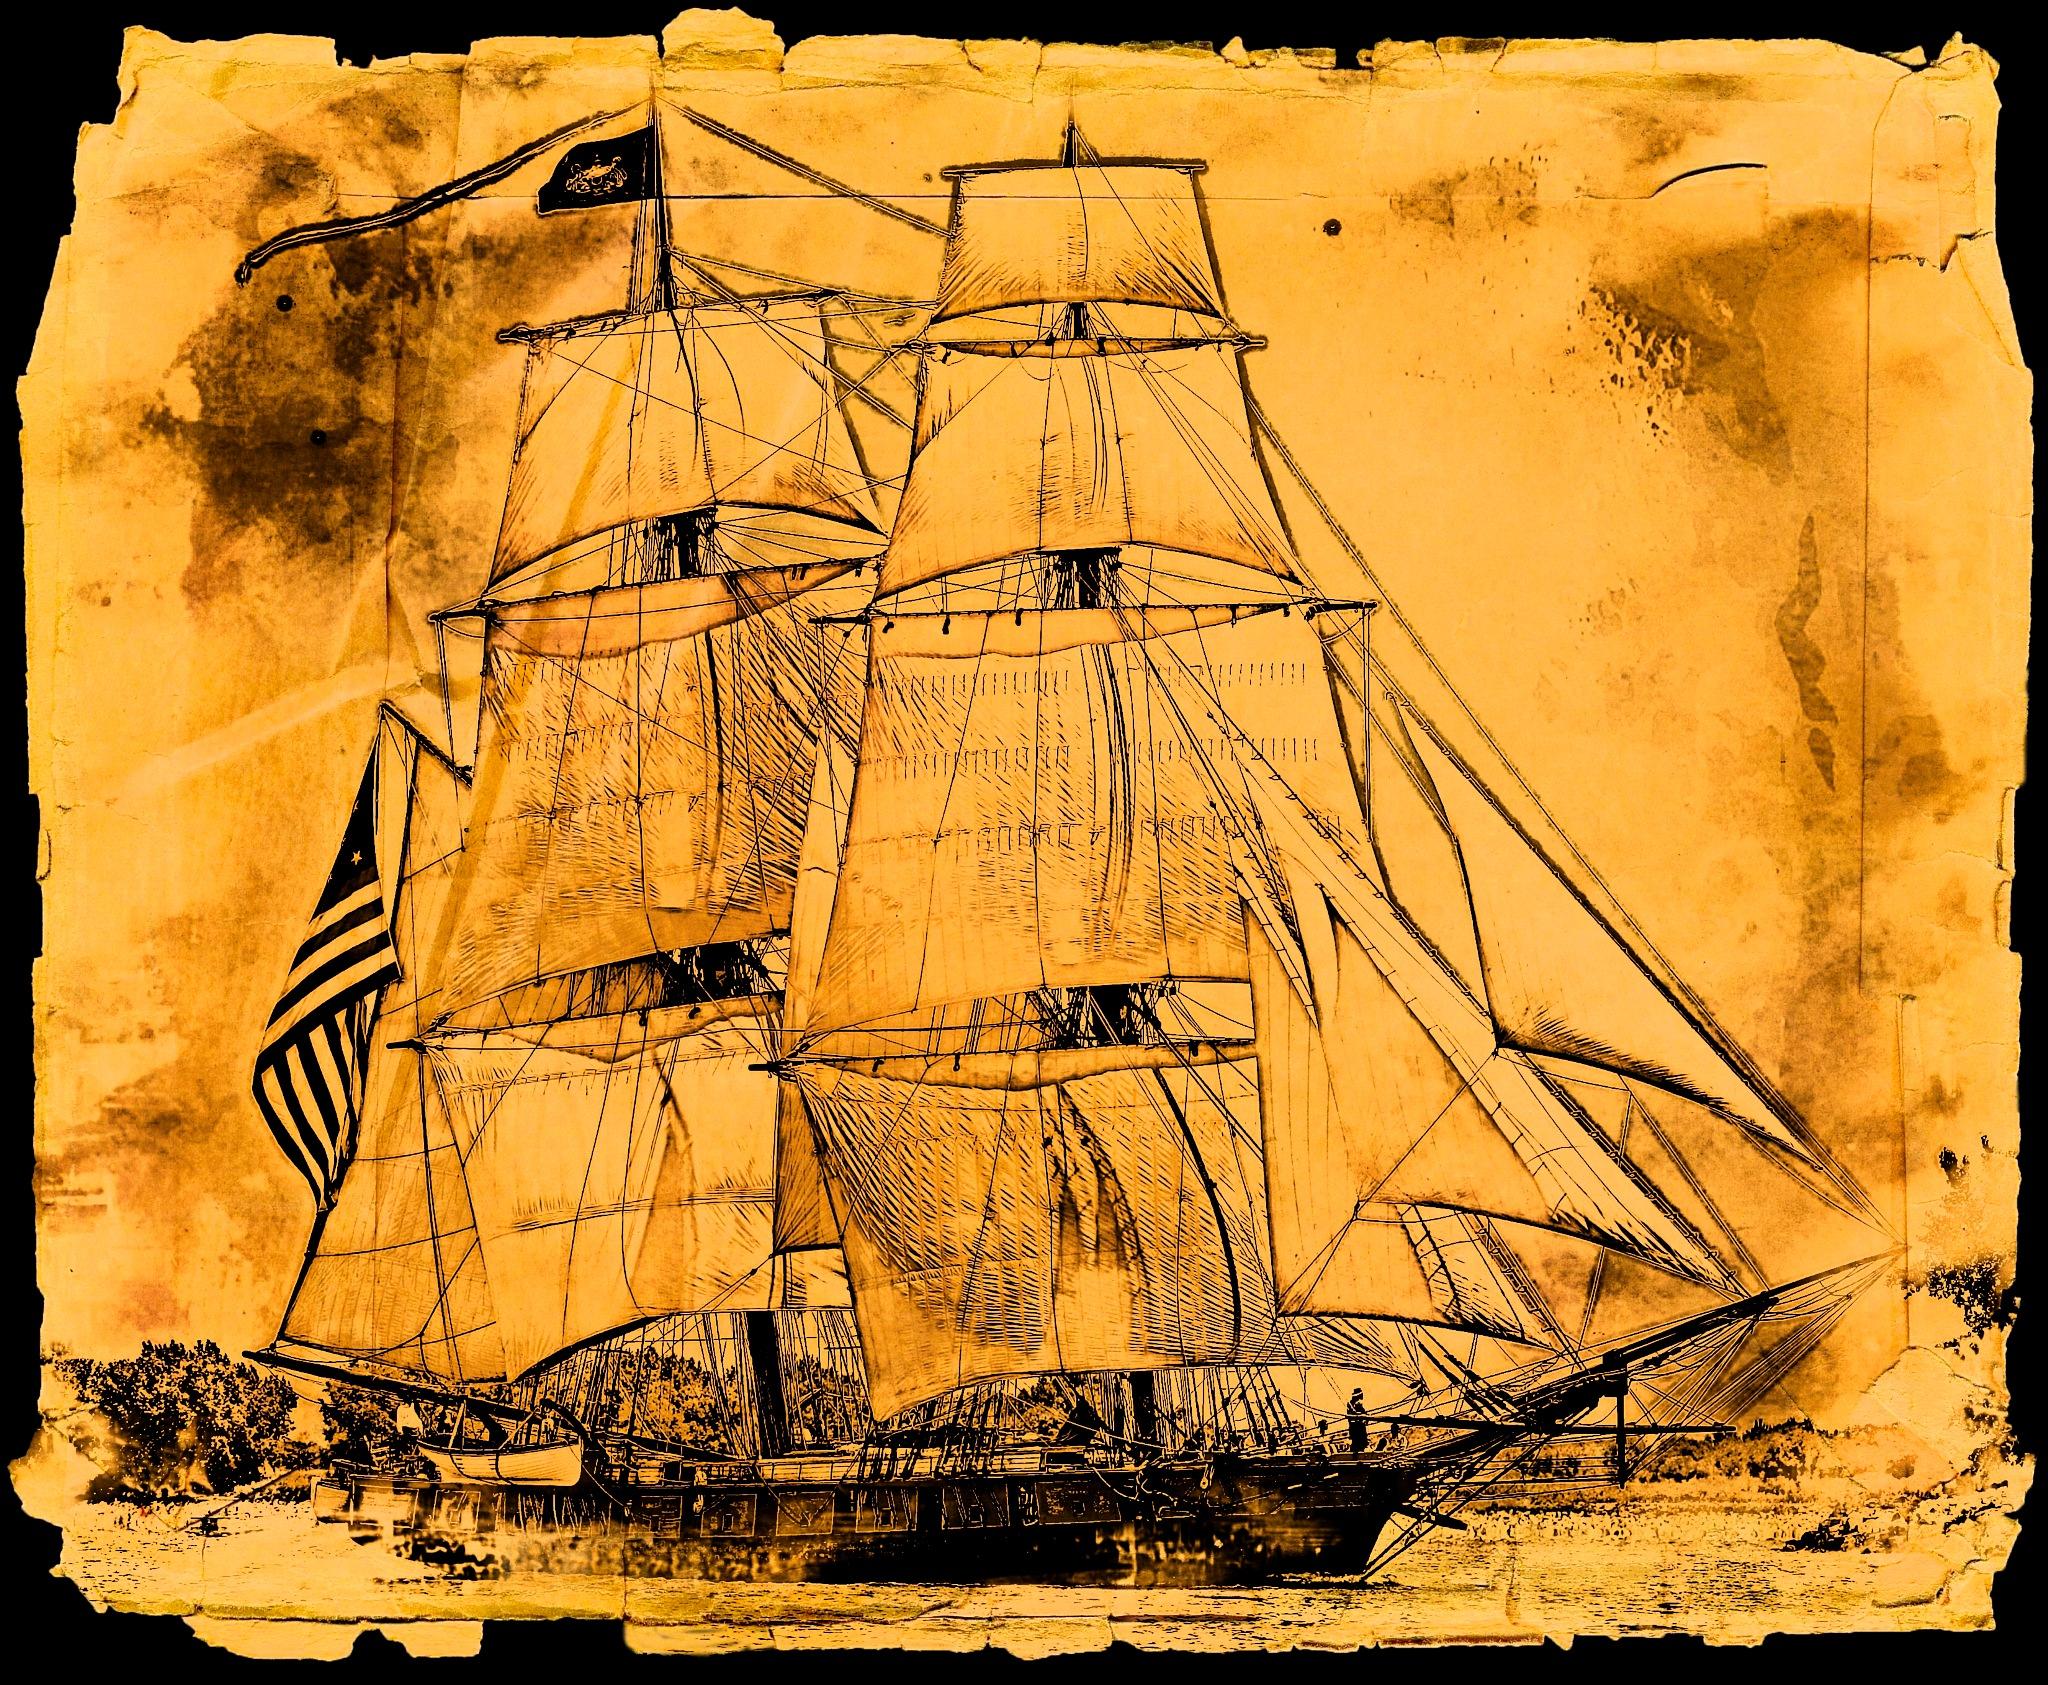 Tall Sailing Ship by Brigitte Werner